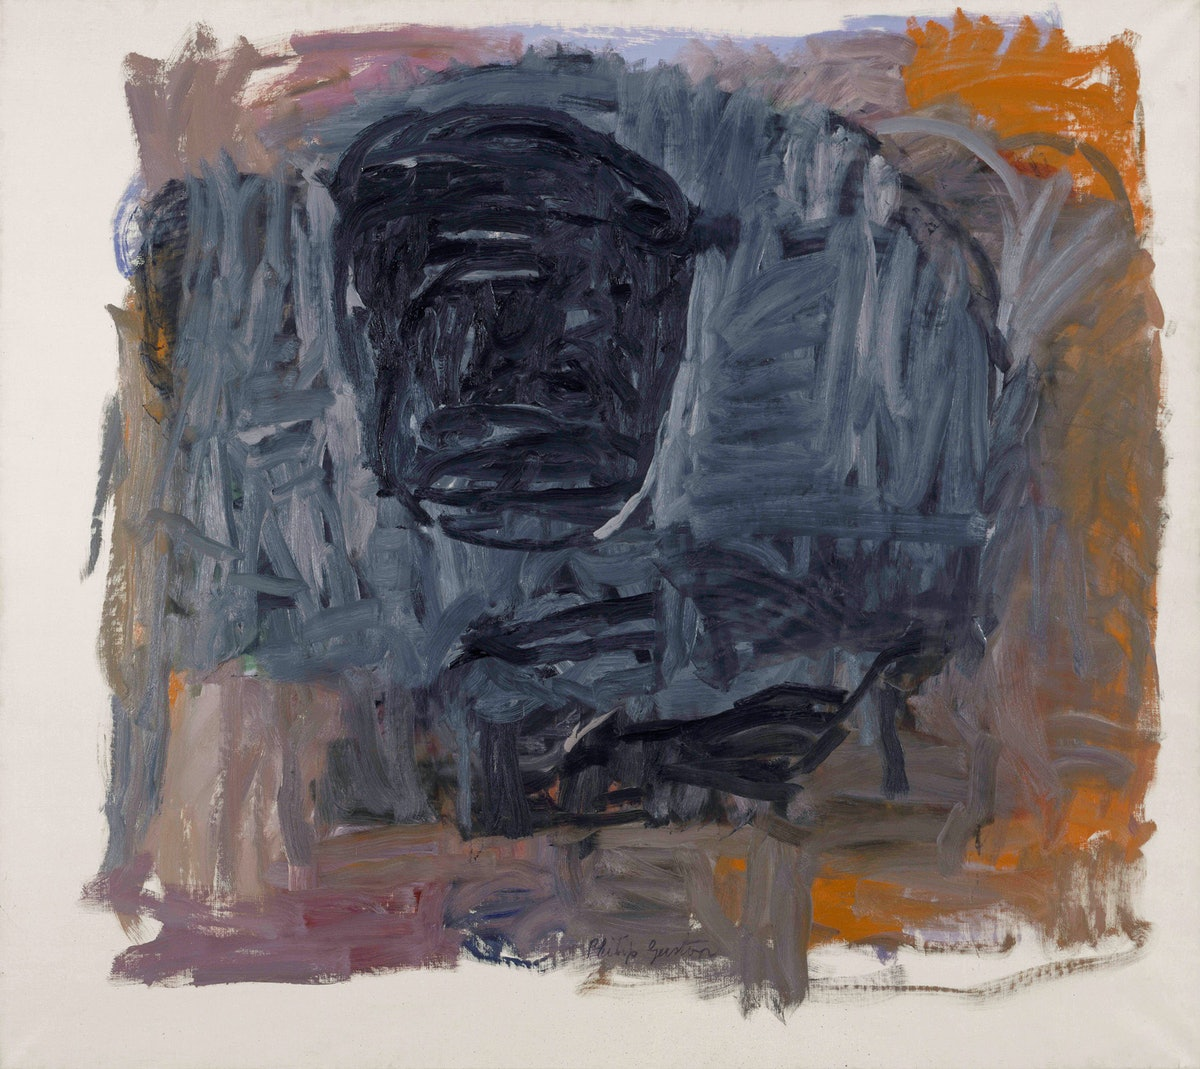 P6301_Painter_III_1963-1